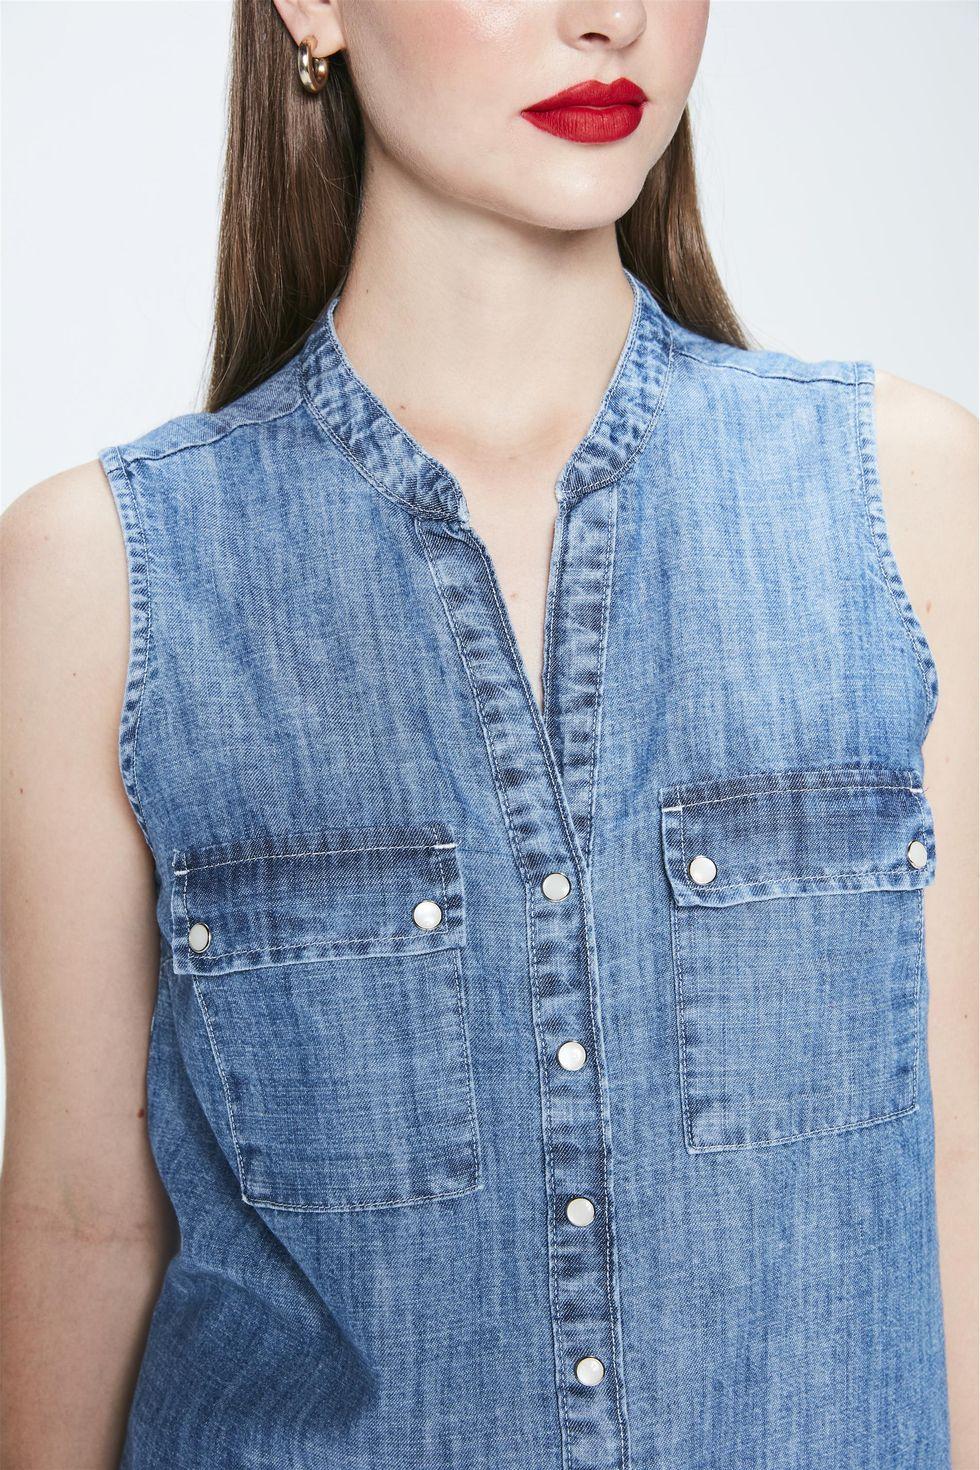 Camisa-Regata-Jeans-Feminina-Frente--